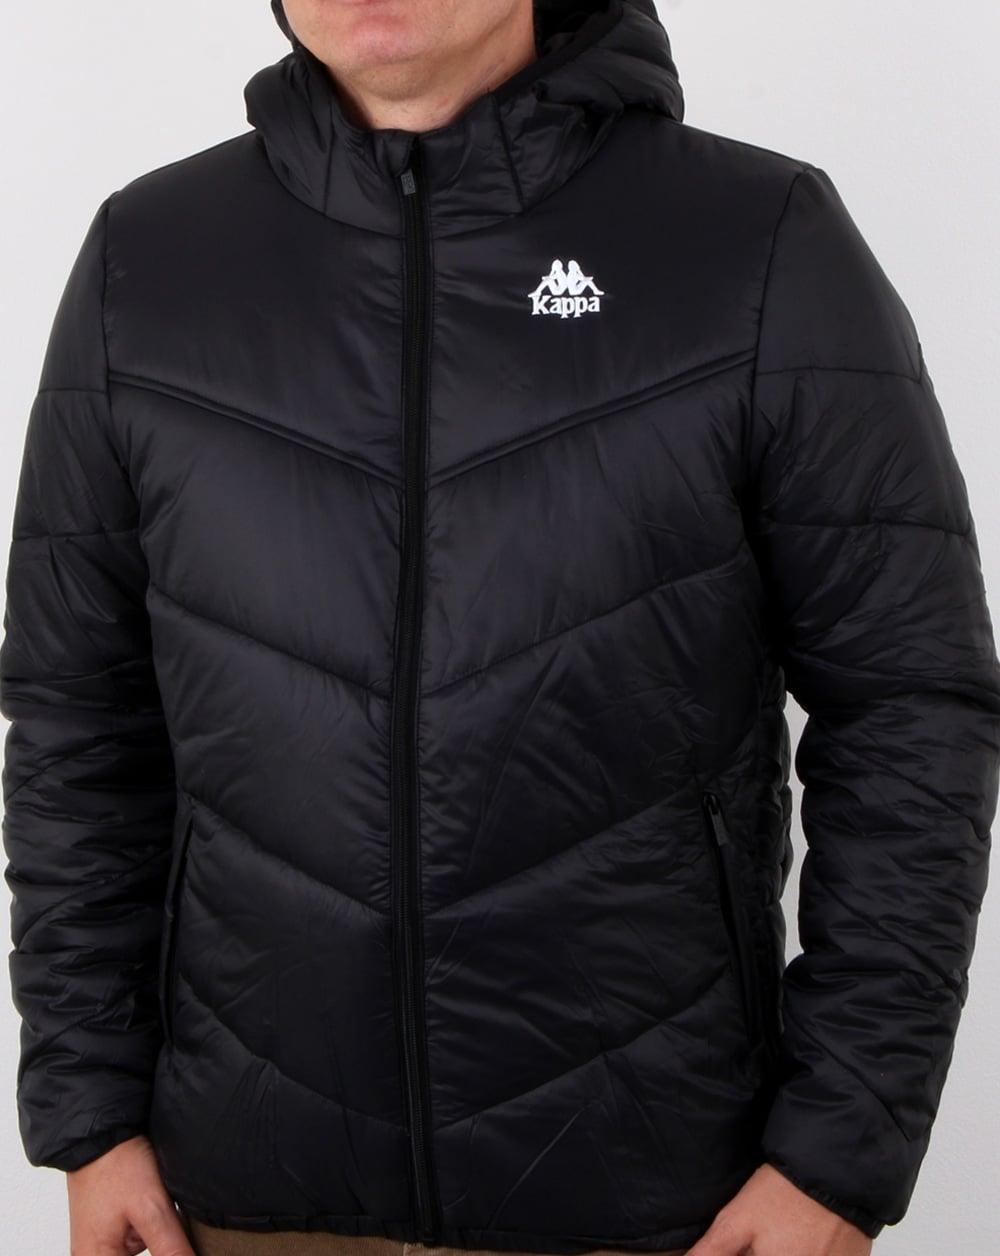 Kappa Ramos Jacket Black Mens Quilted Padded Hood